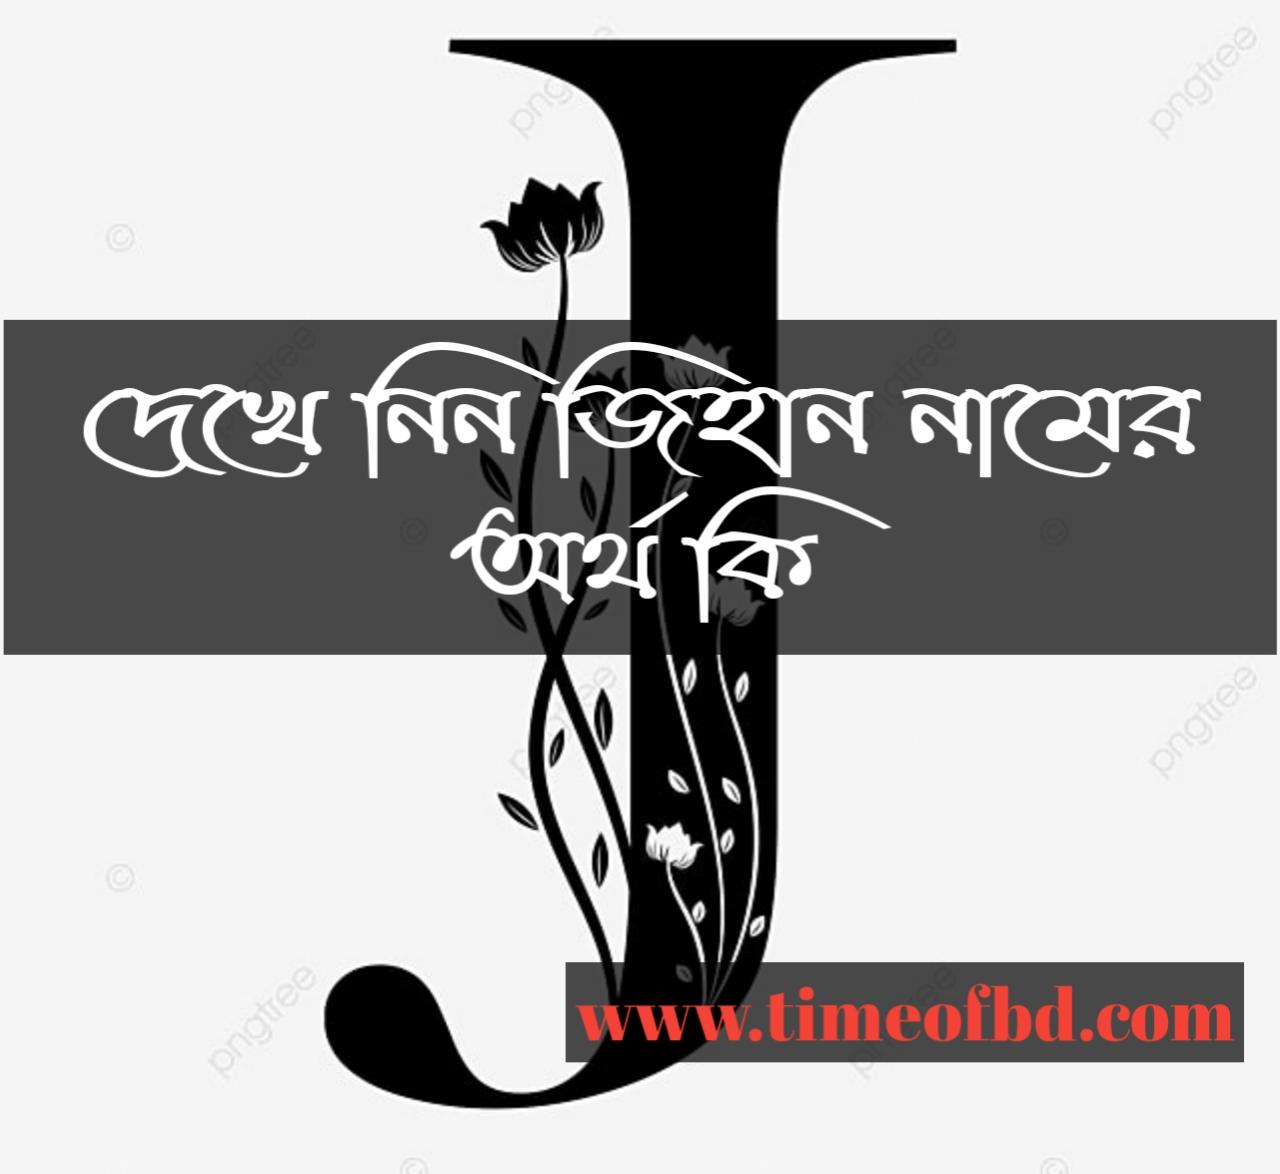 Jihan name meaning in Bengali, জিহান নামের অর্থ কি, জিহান নামের বাংলা অর্থ কি, জিহান নামের ইসলামিক অর্থ কি,